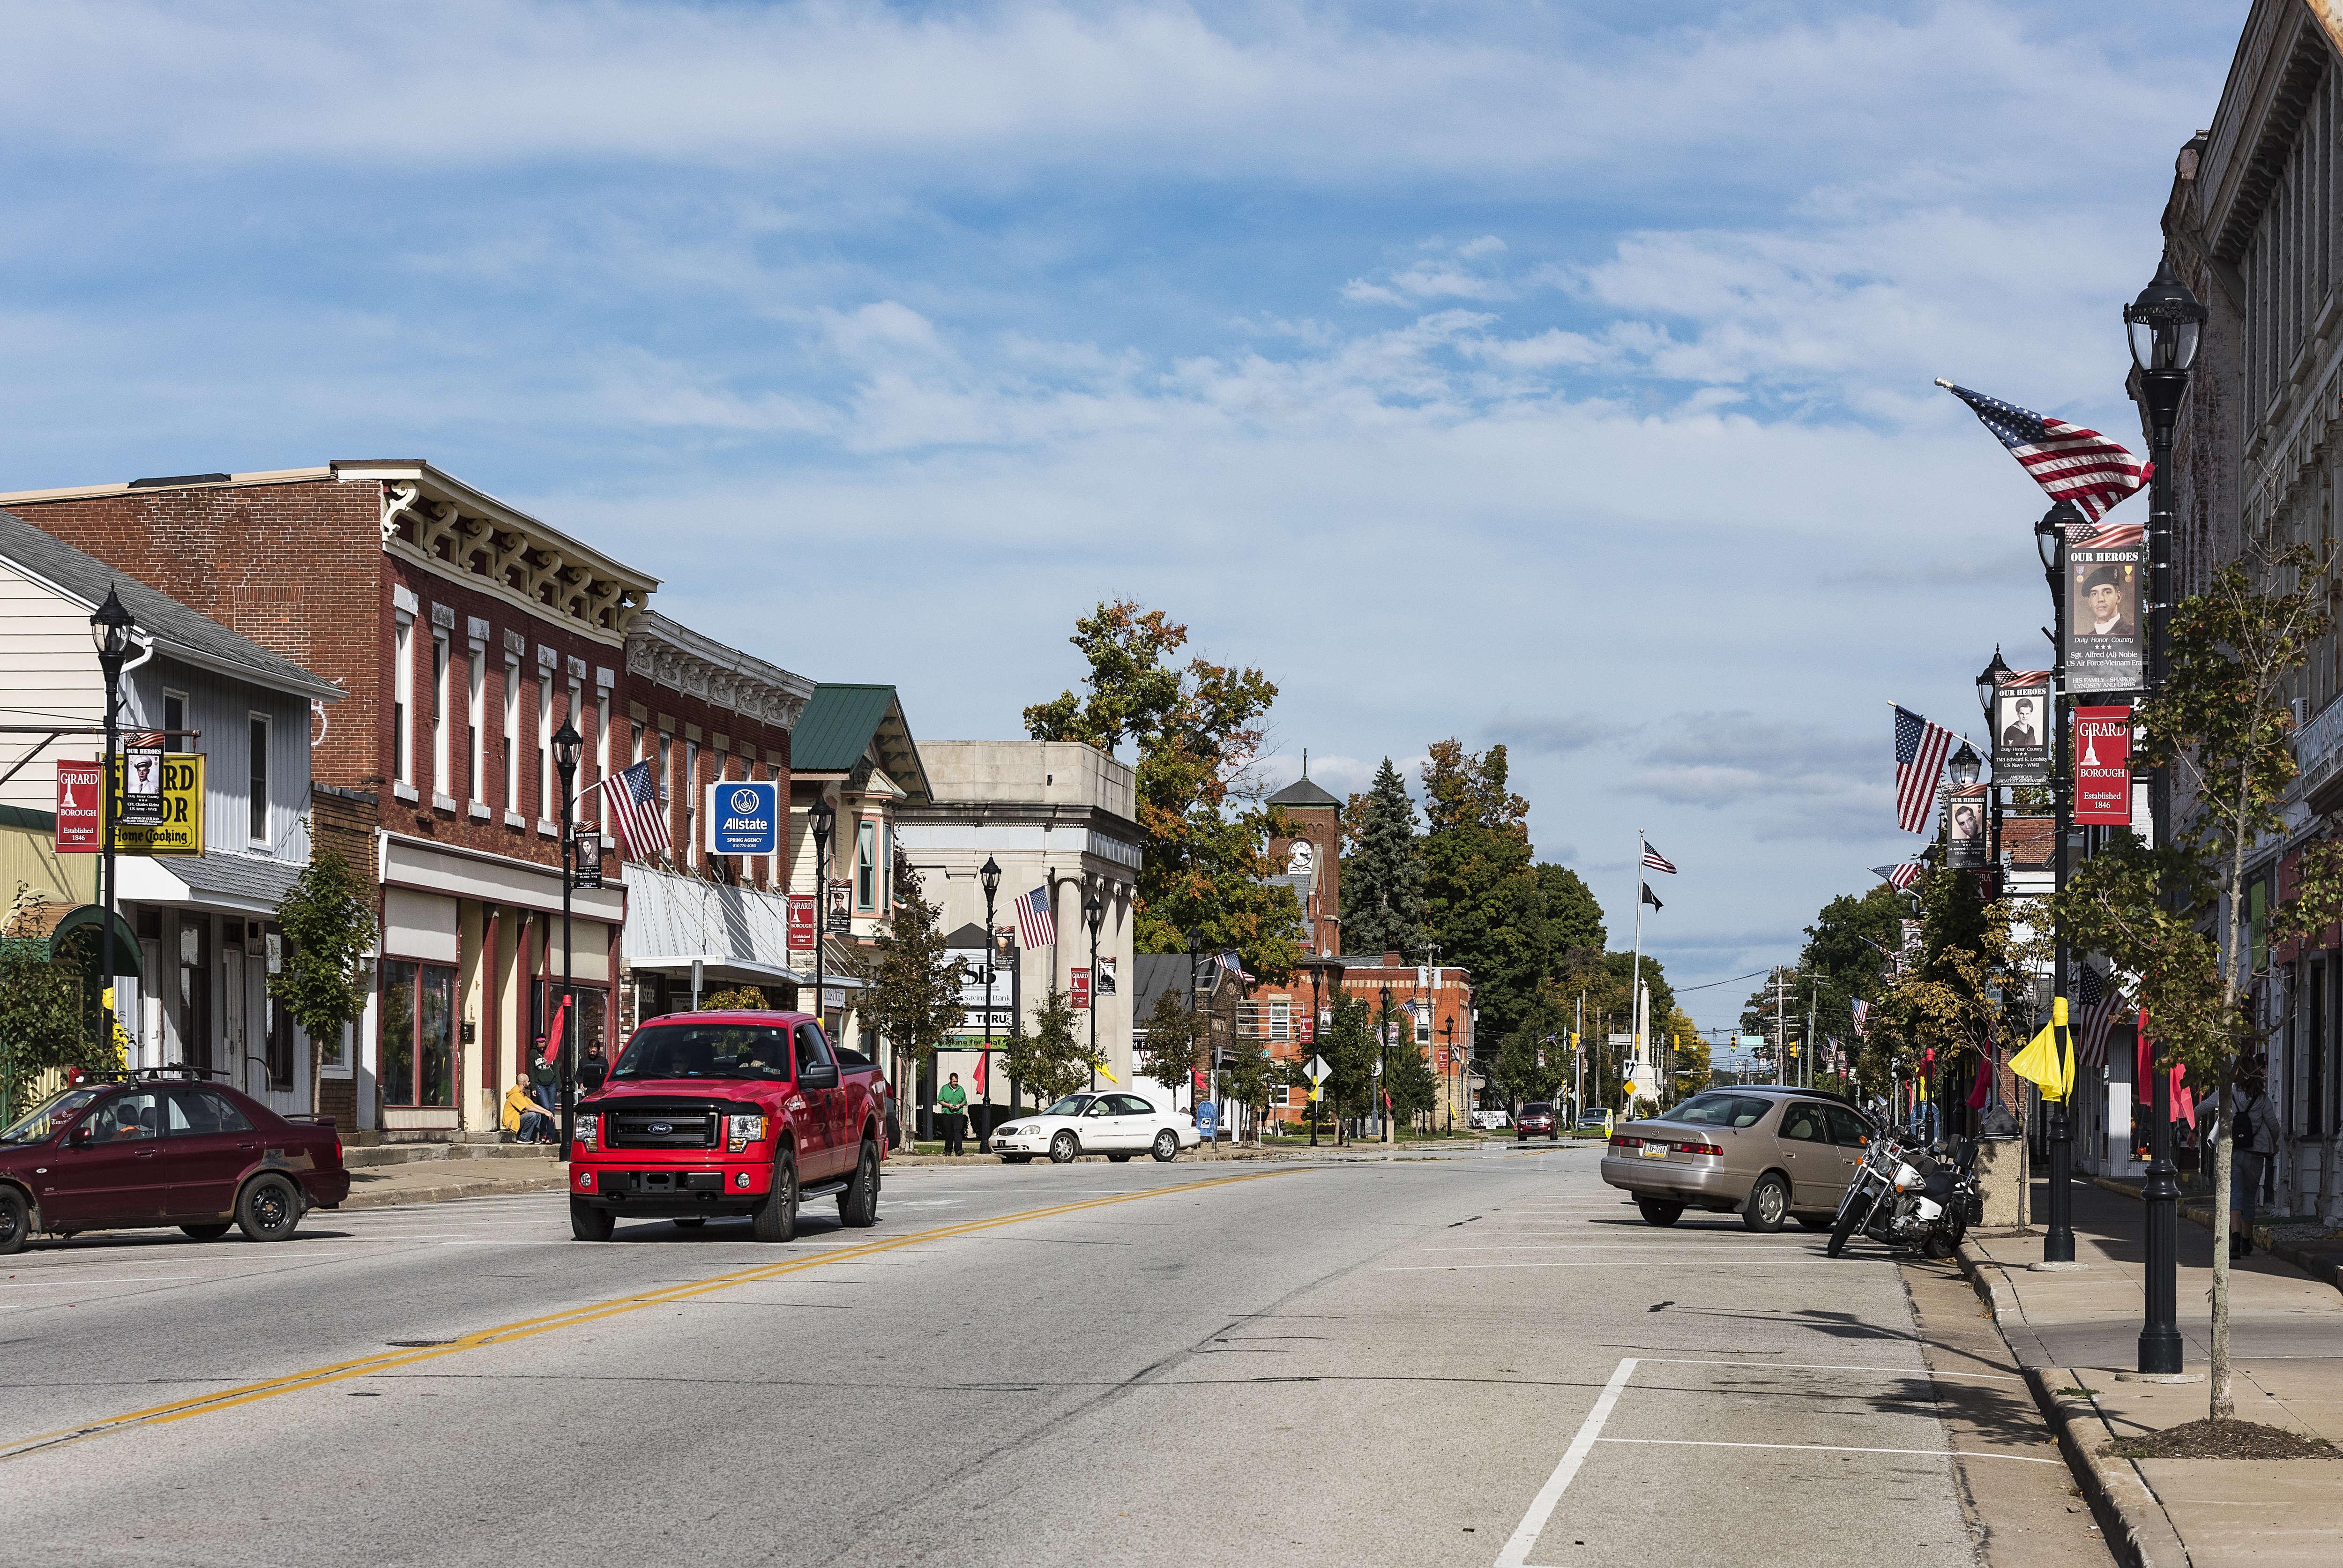 A shot of the main street of Girard, Pennsylvania